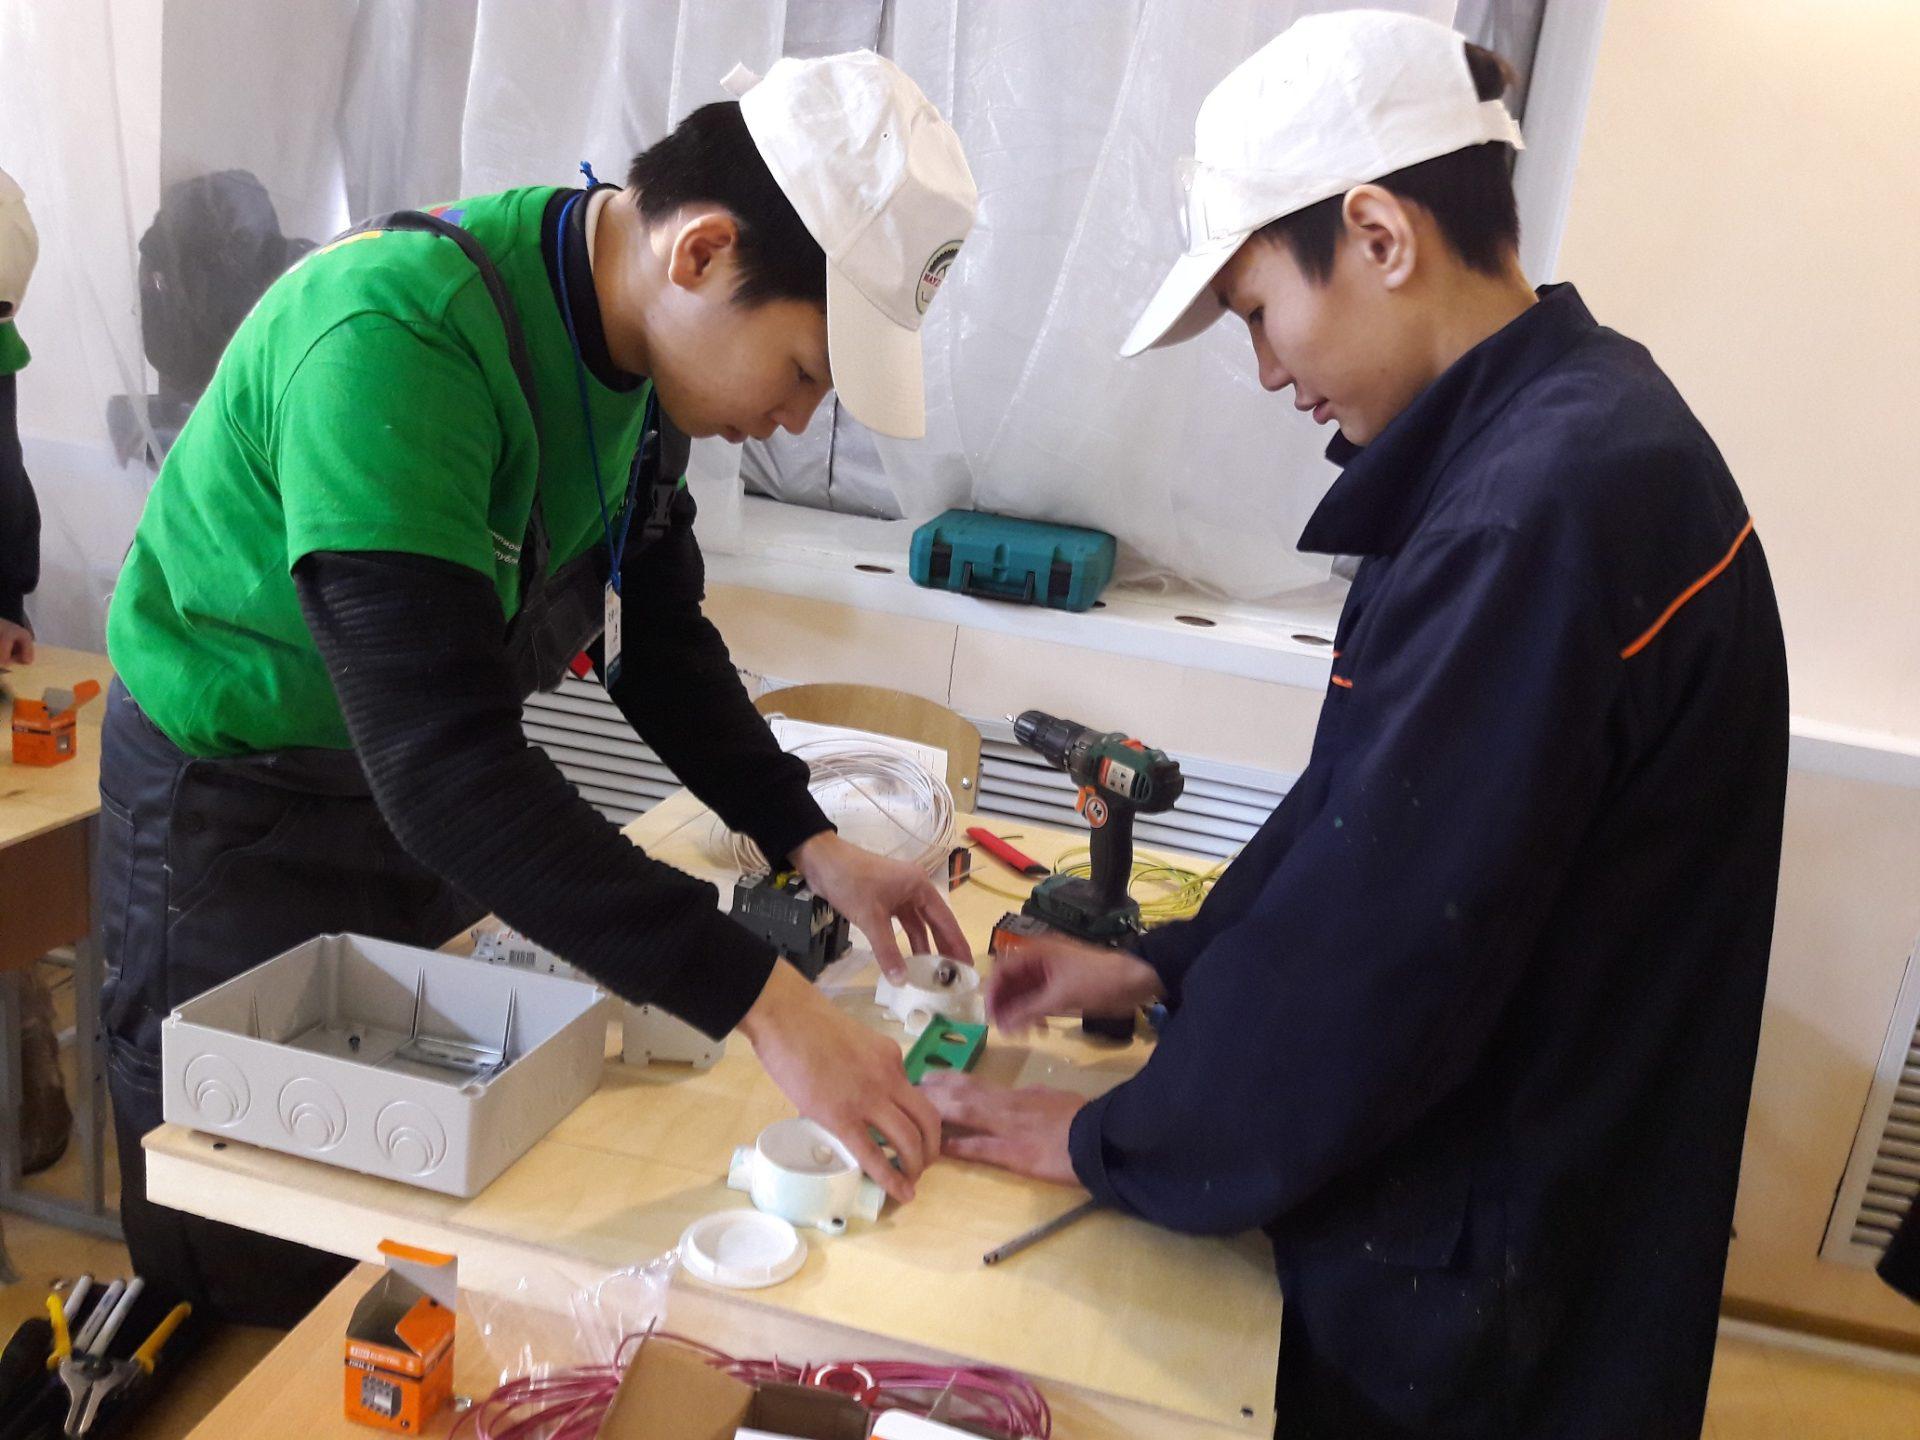 III Региональный чемпионат JuniorSkills: электромонтажные работы